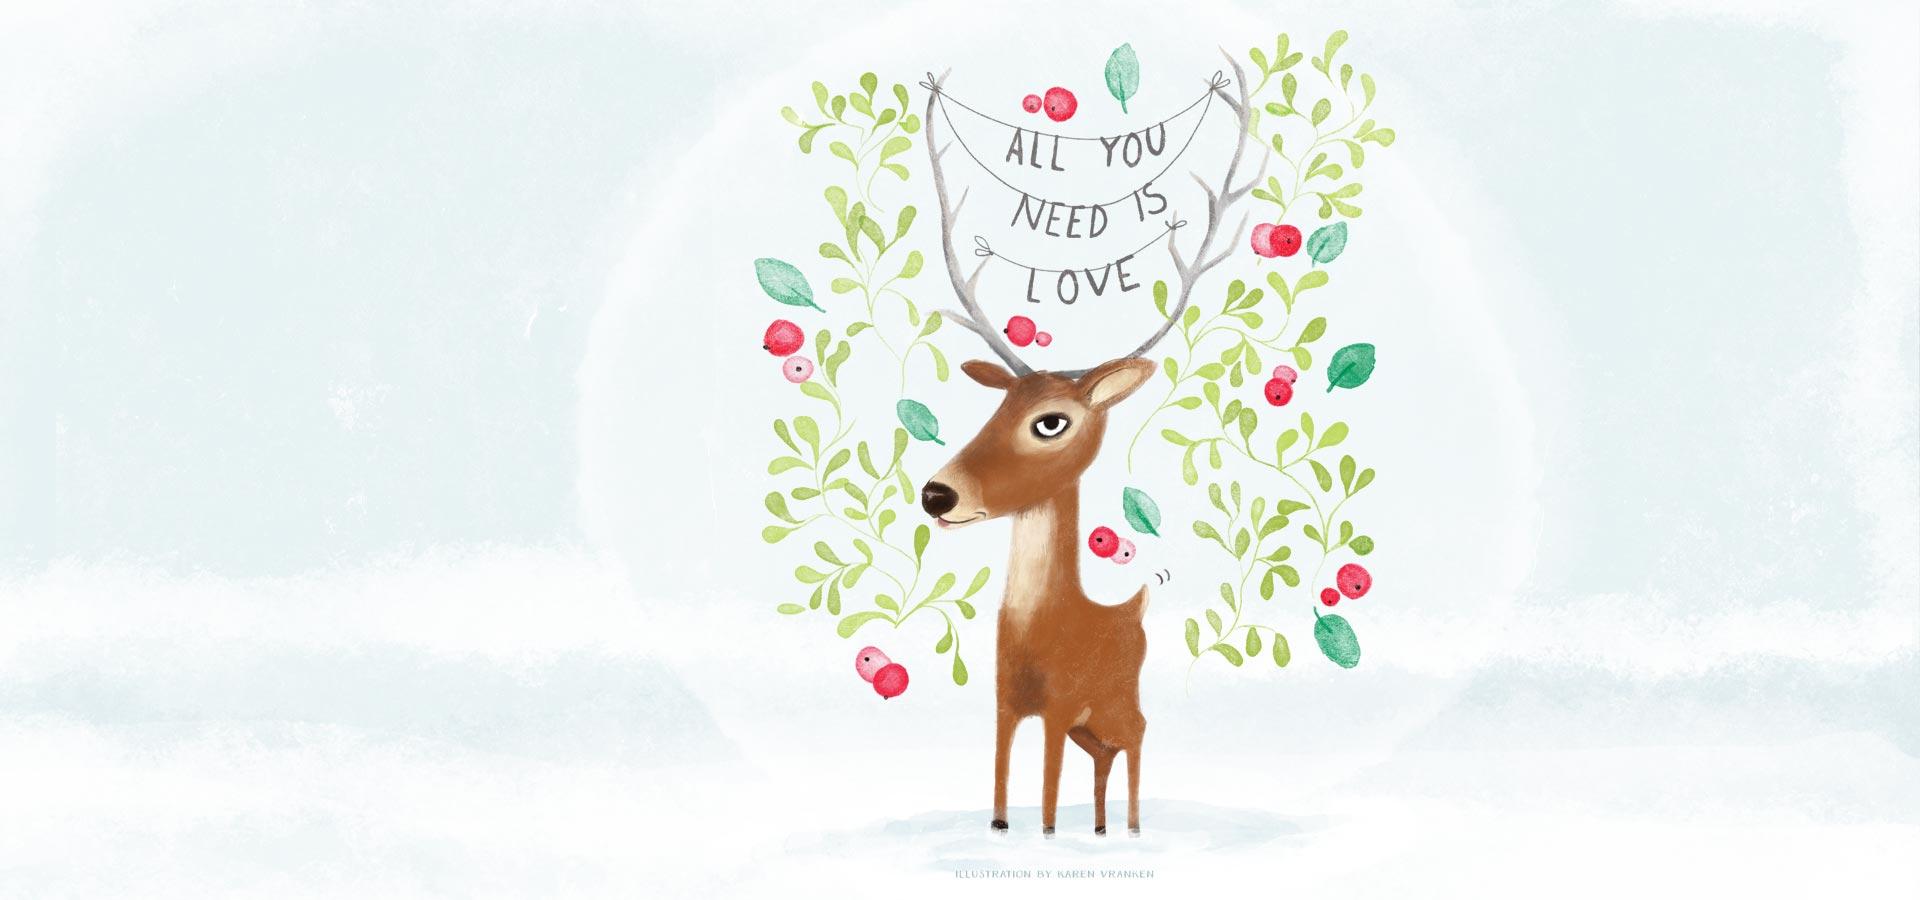 seasonal wallpaper